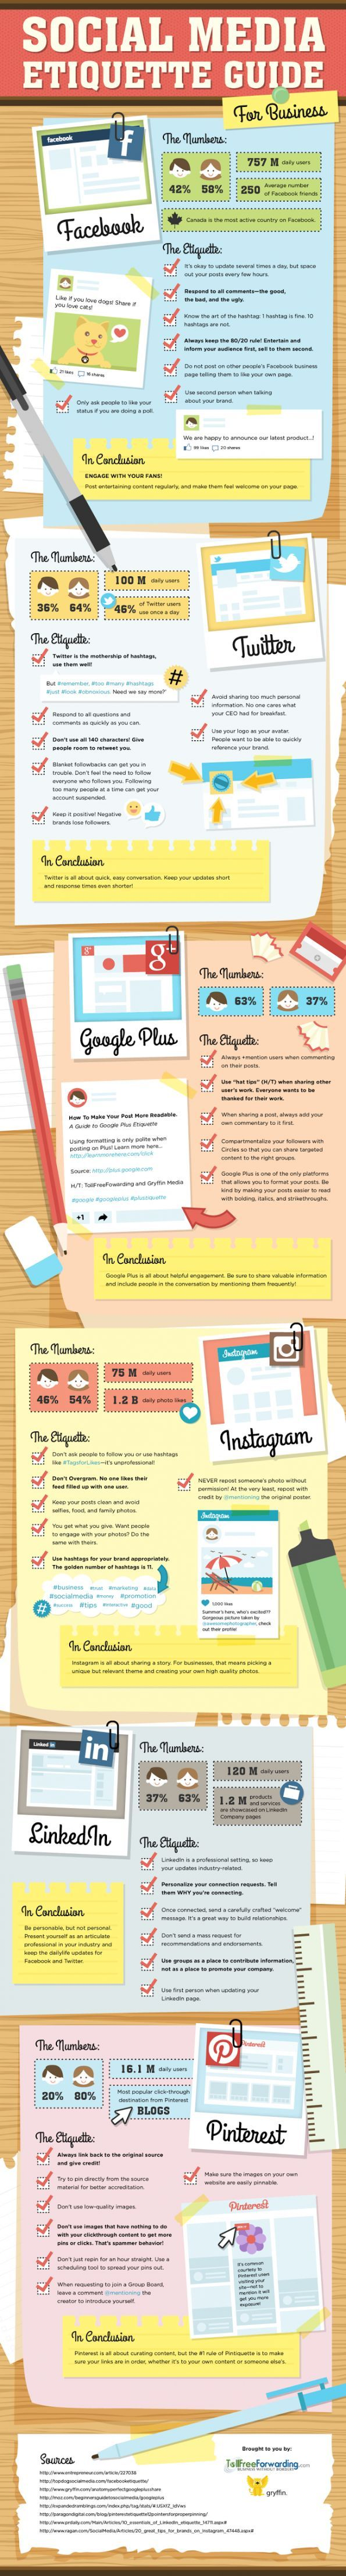 Social media etiquette: do's en don'ts [infographic] - Frankwatching